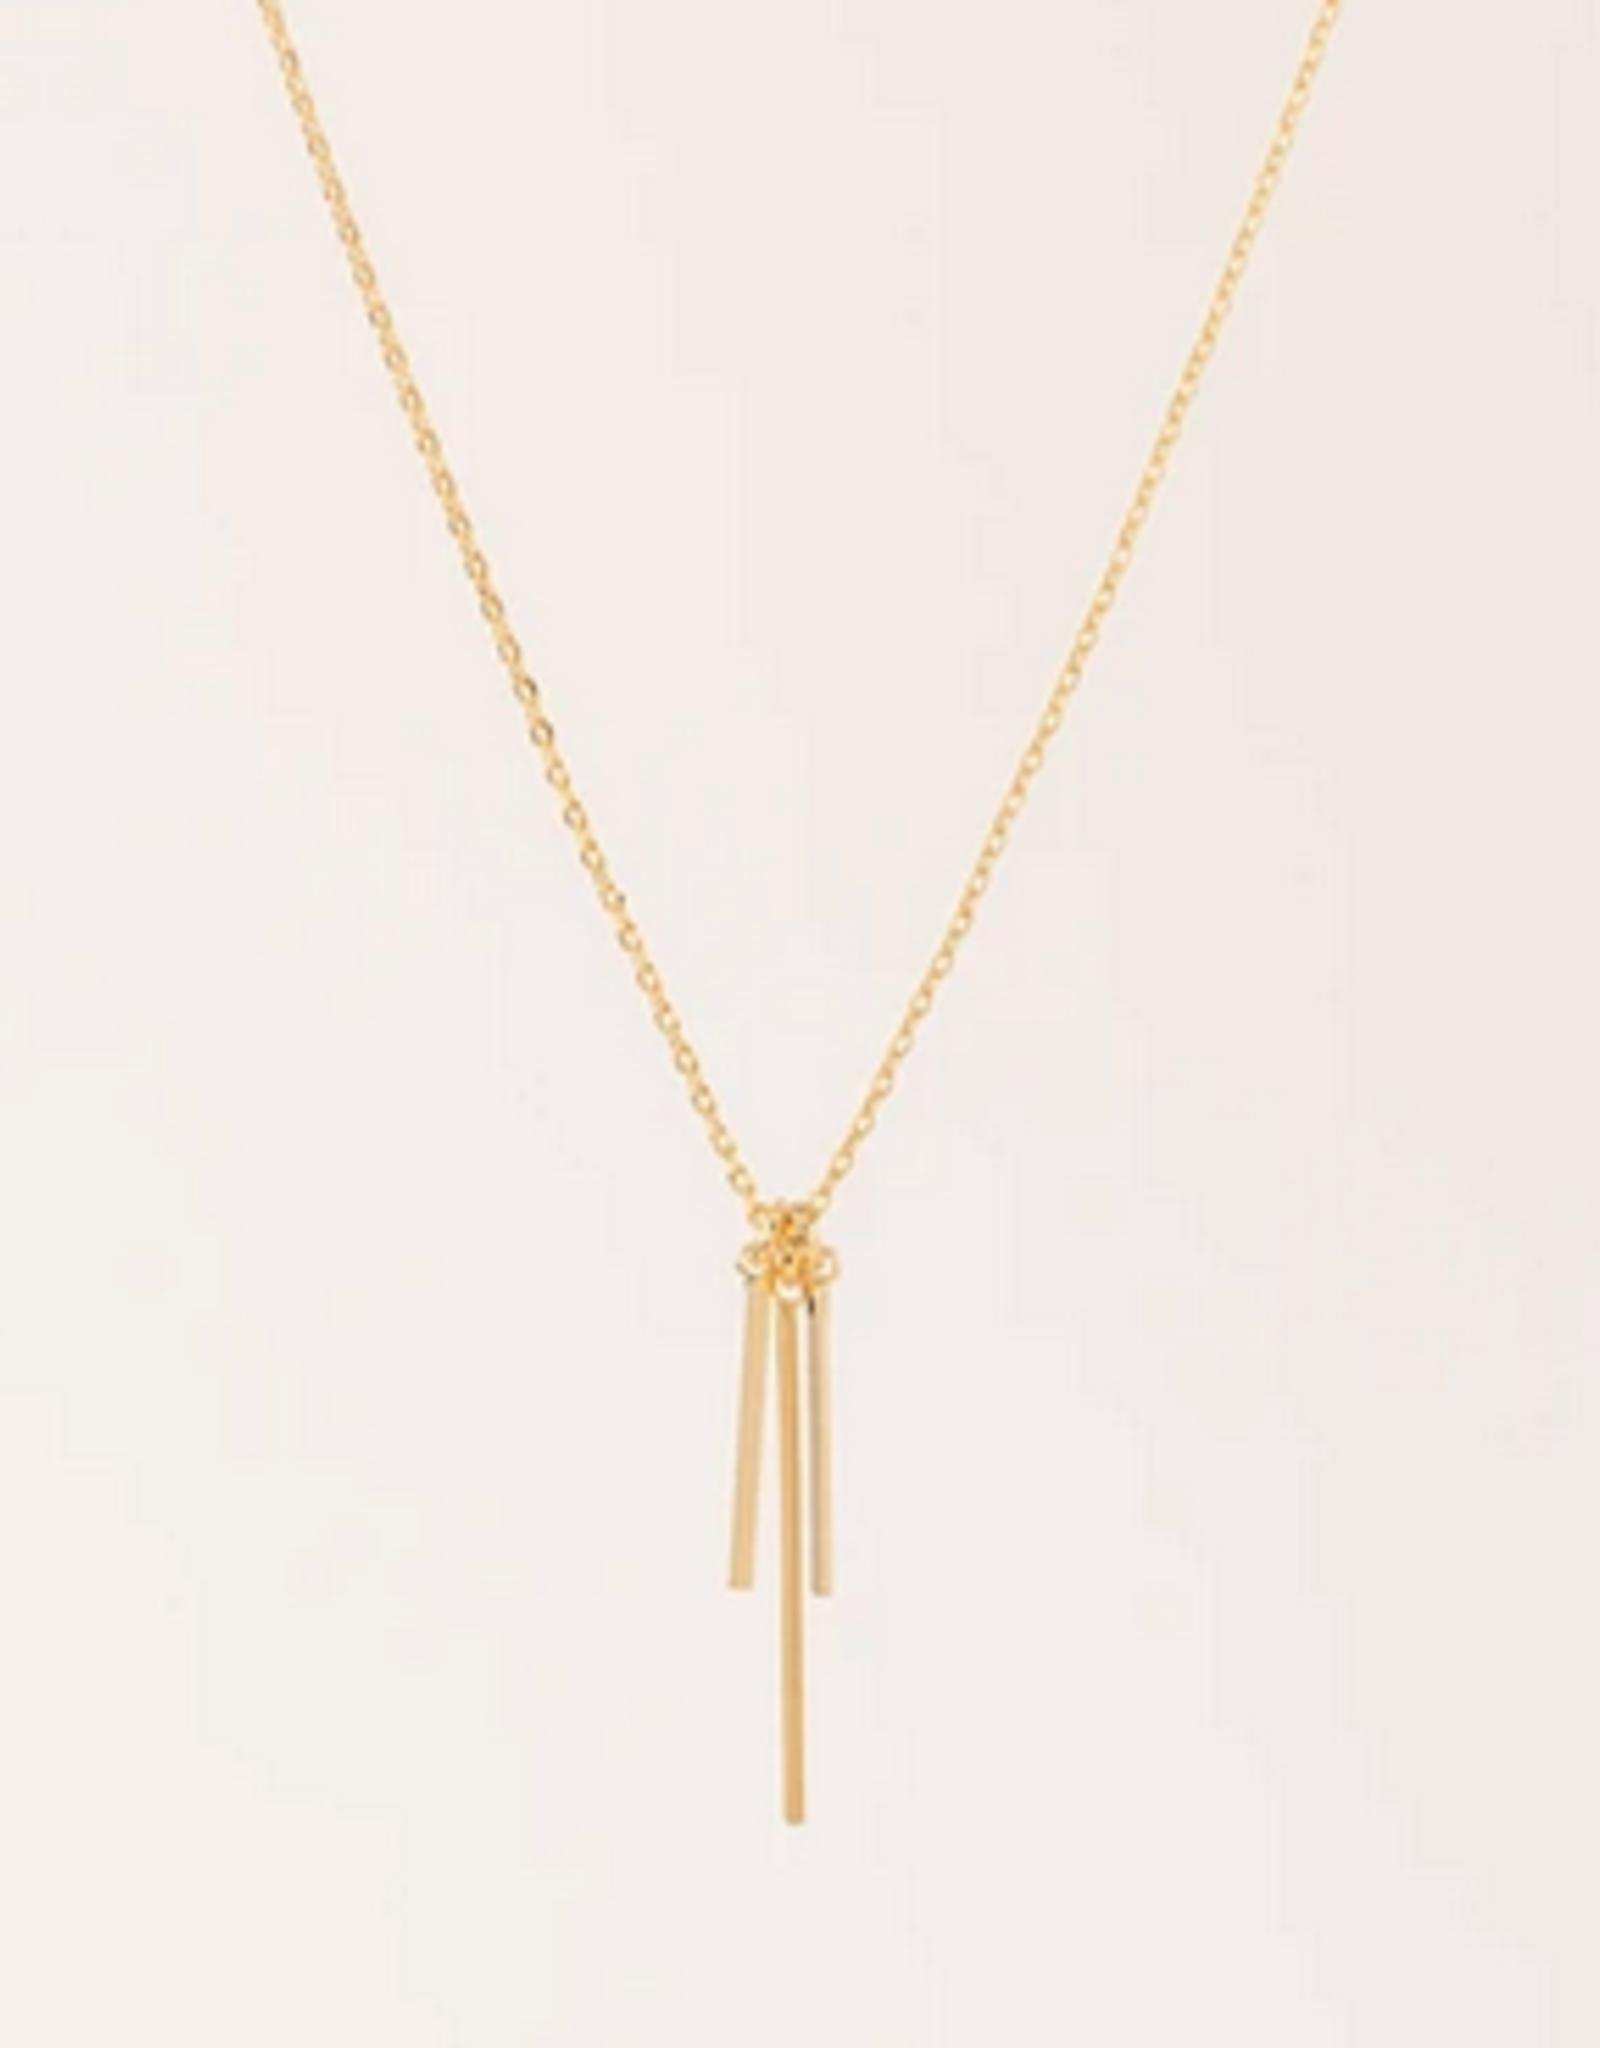 Judd Triple Bar Necklace - Gold